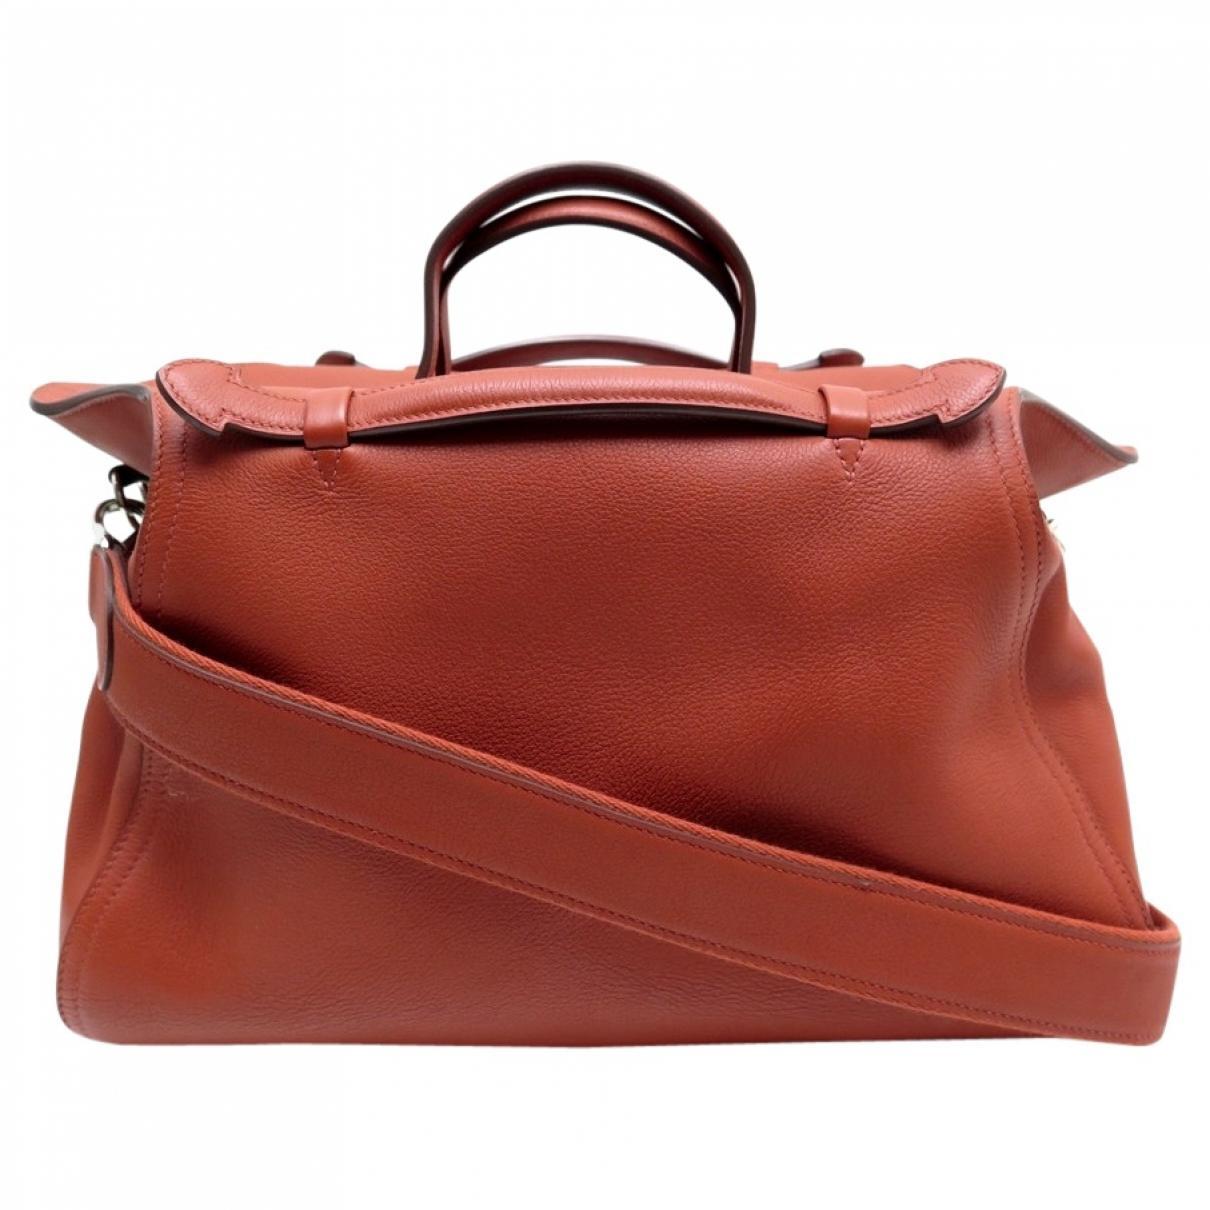 Hermès Oxer Orange Leather Handbag in Orange - Lyst 1293886ecbf19